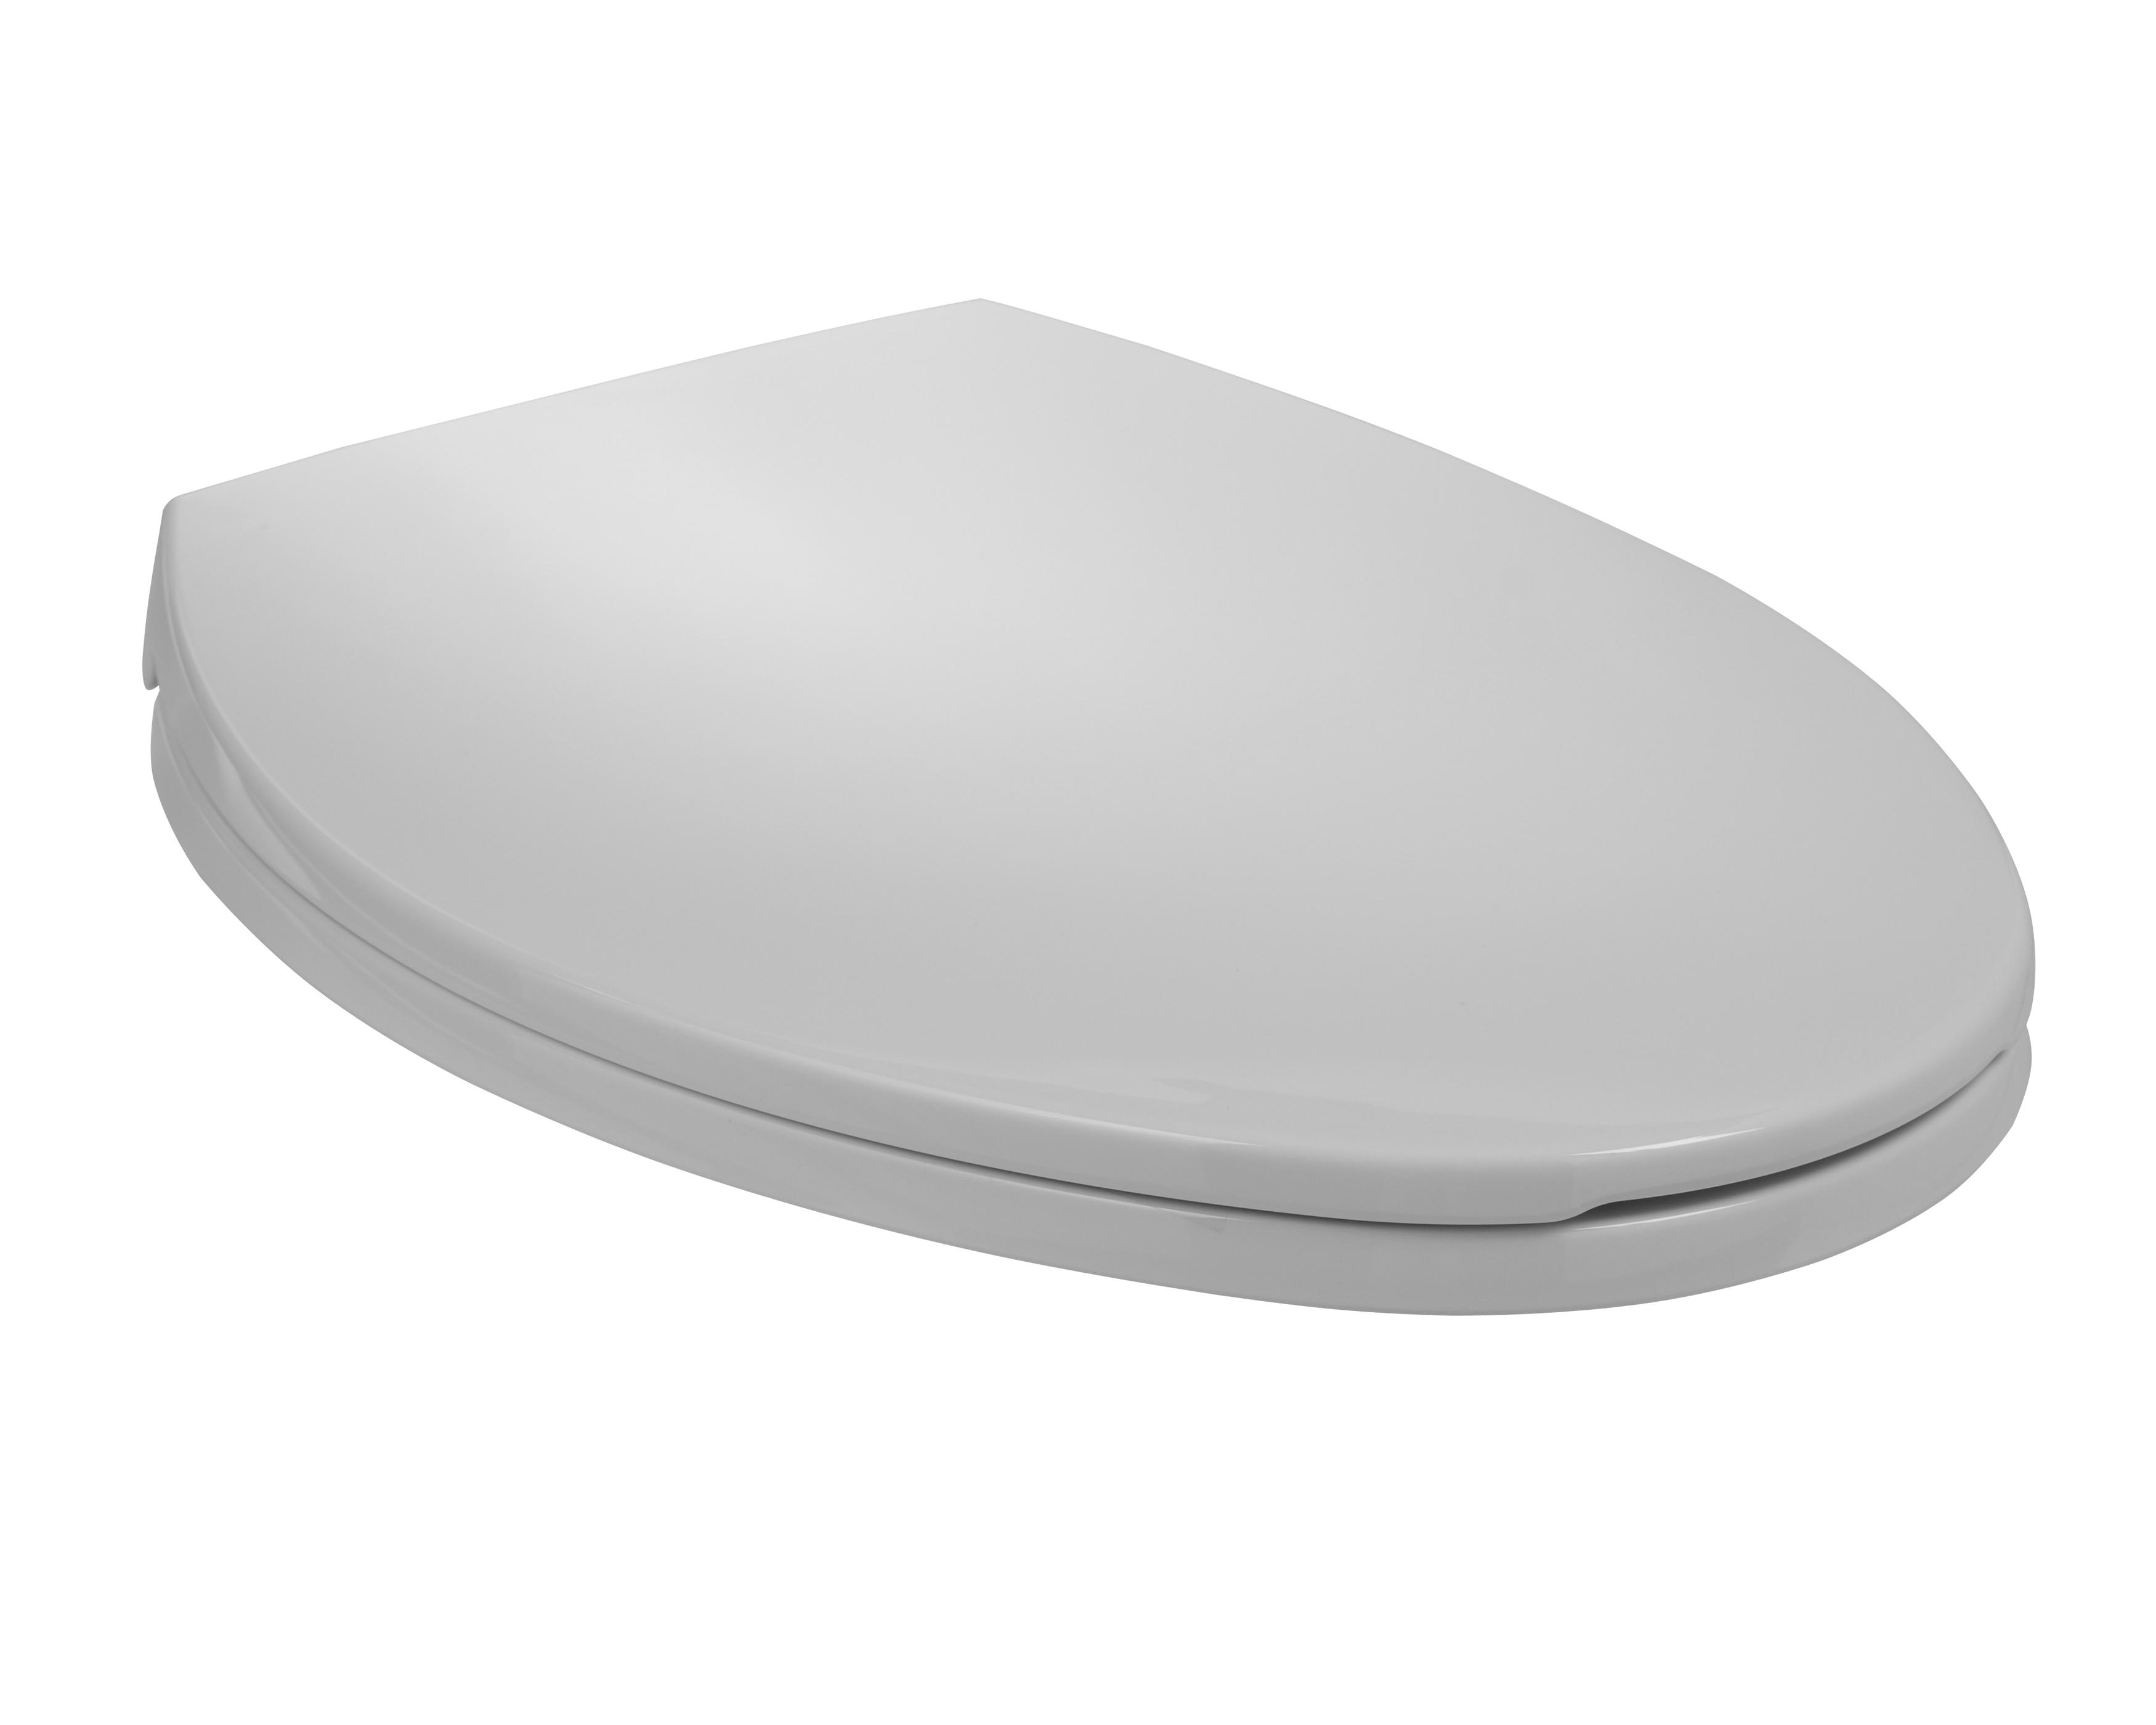 black and white toilet seat.  SmartClose Toilet Seat Model SB700 Mansfield Plumbing